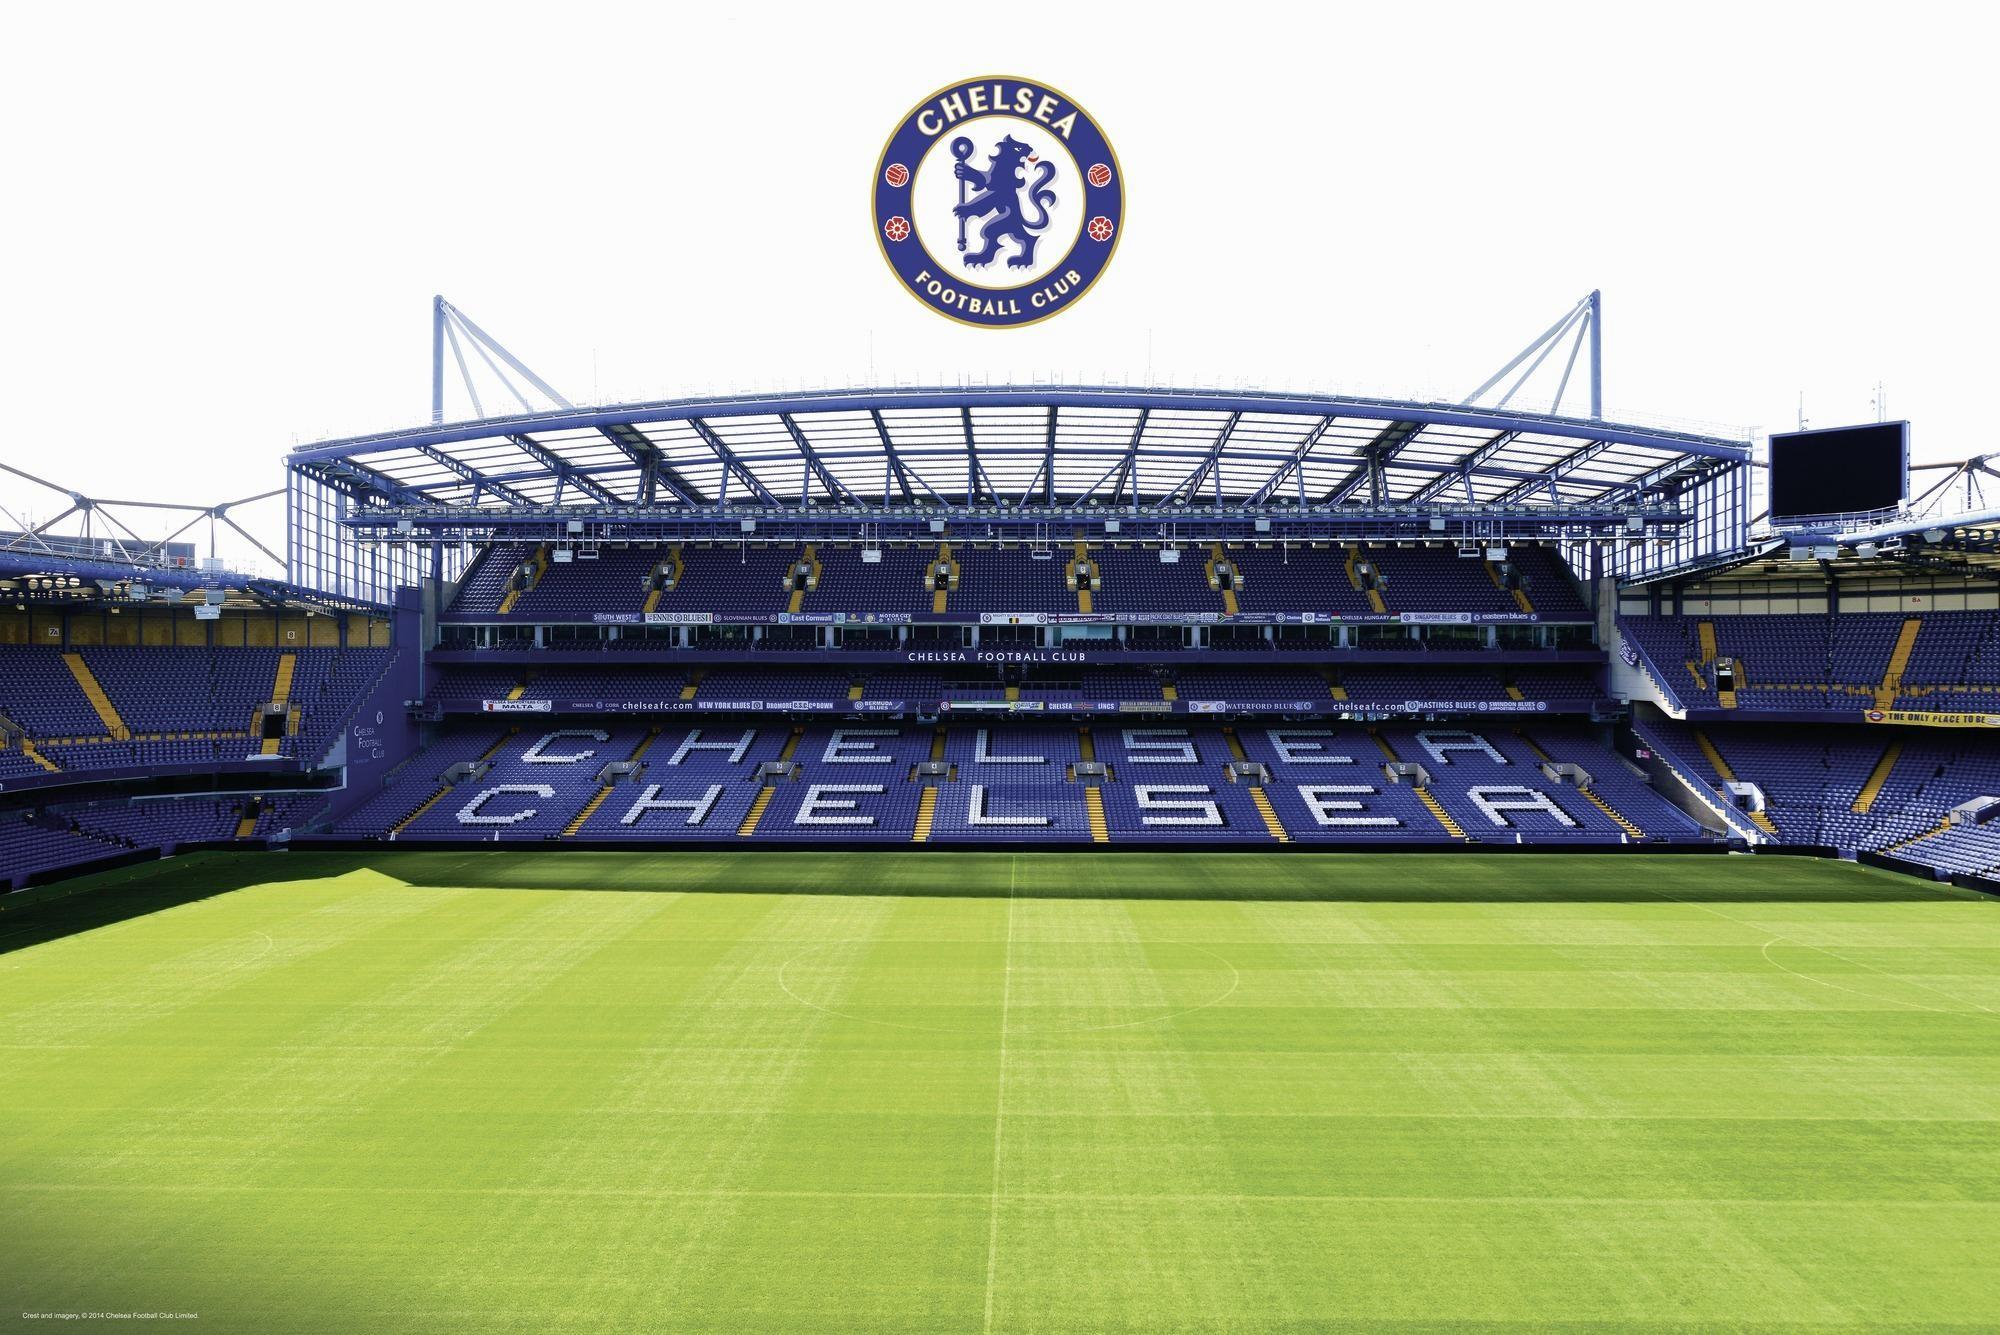 Chelsea-to-Build-New-Stamford-Bridge-Background